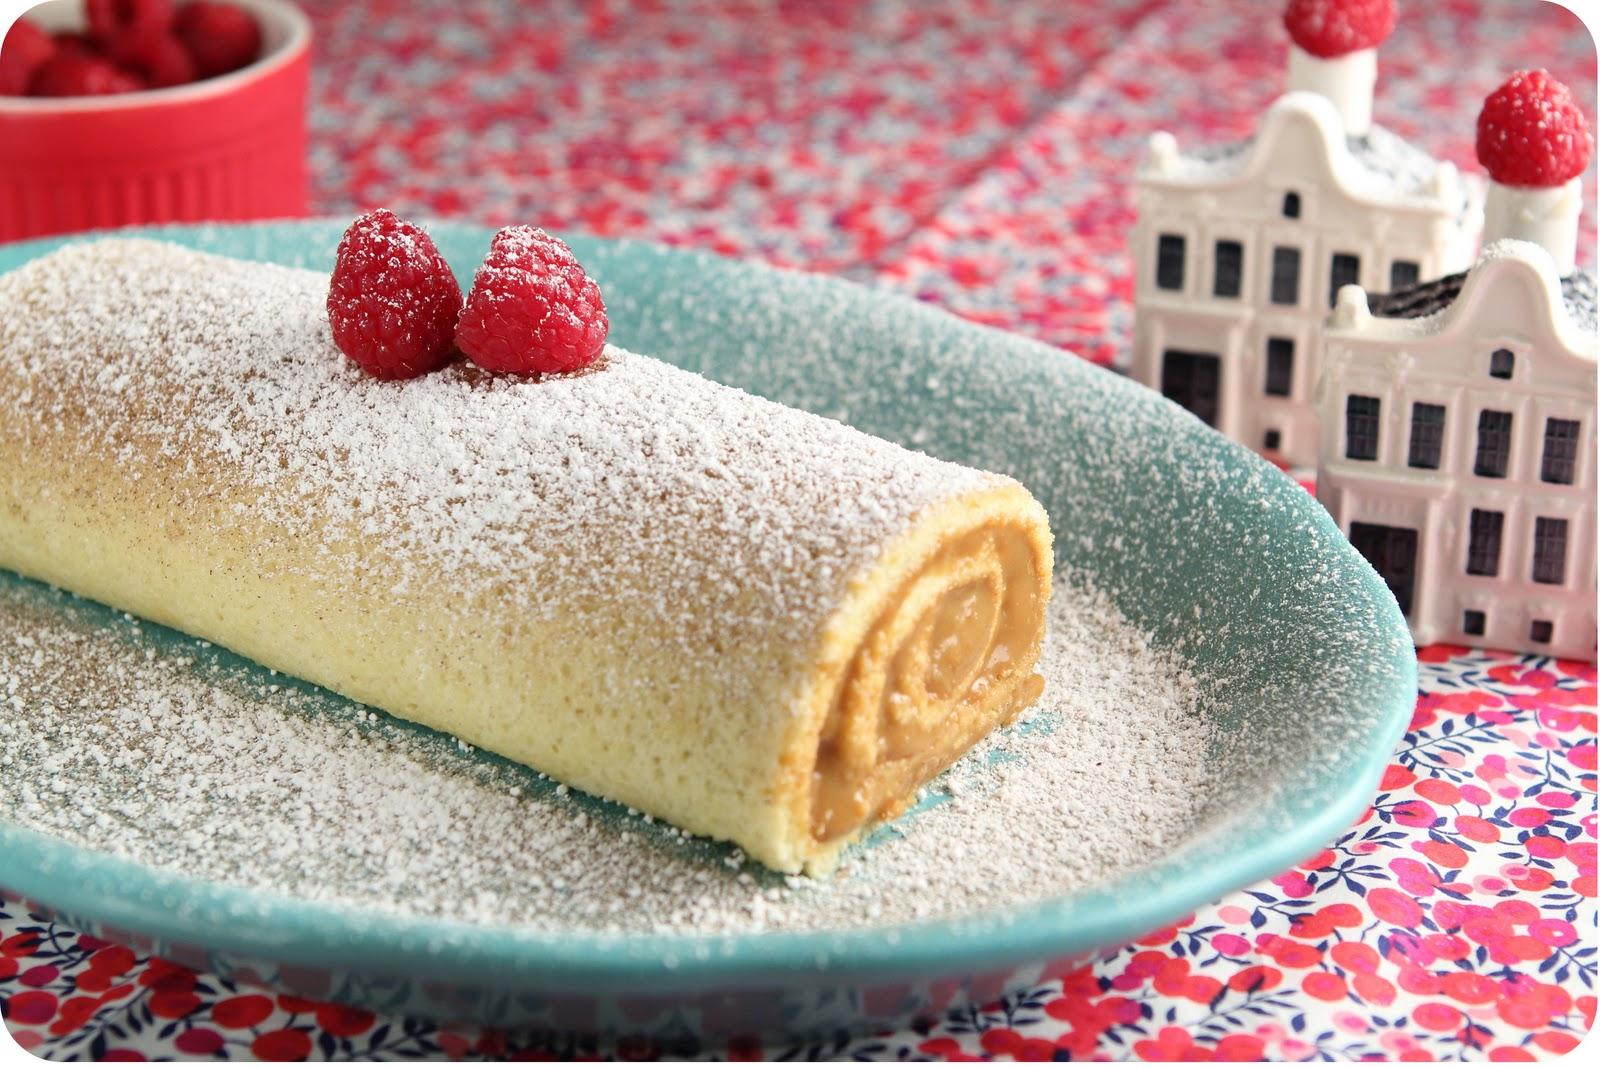 Dulce Delight: Dulce de Leche Rolled Cake